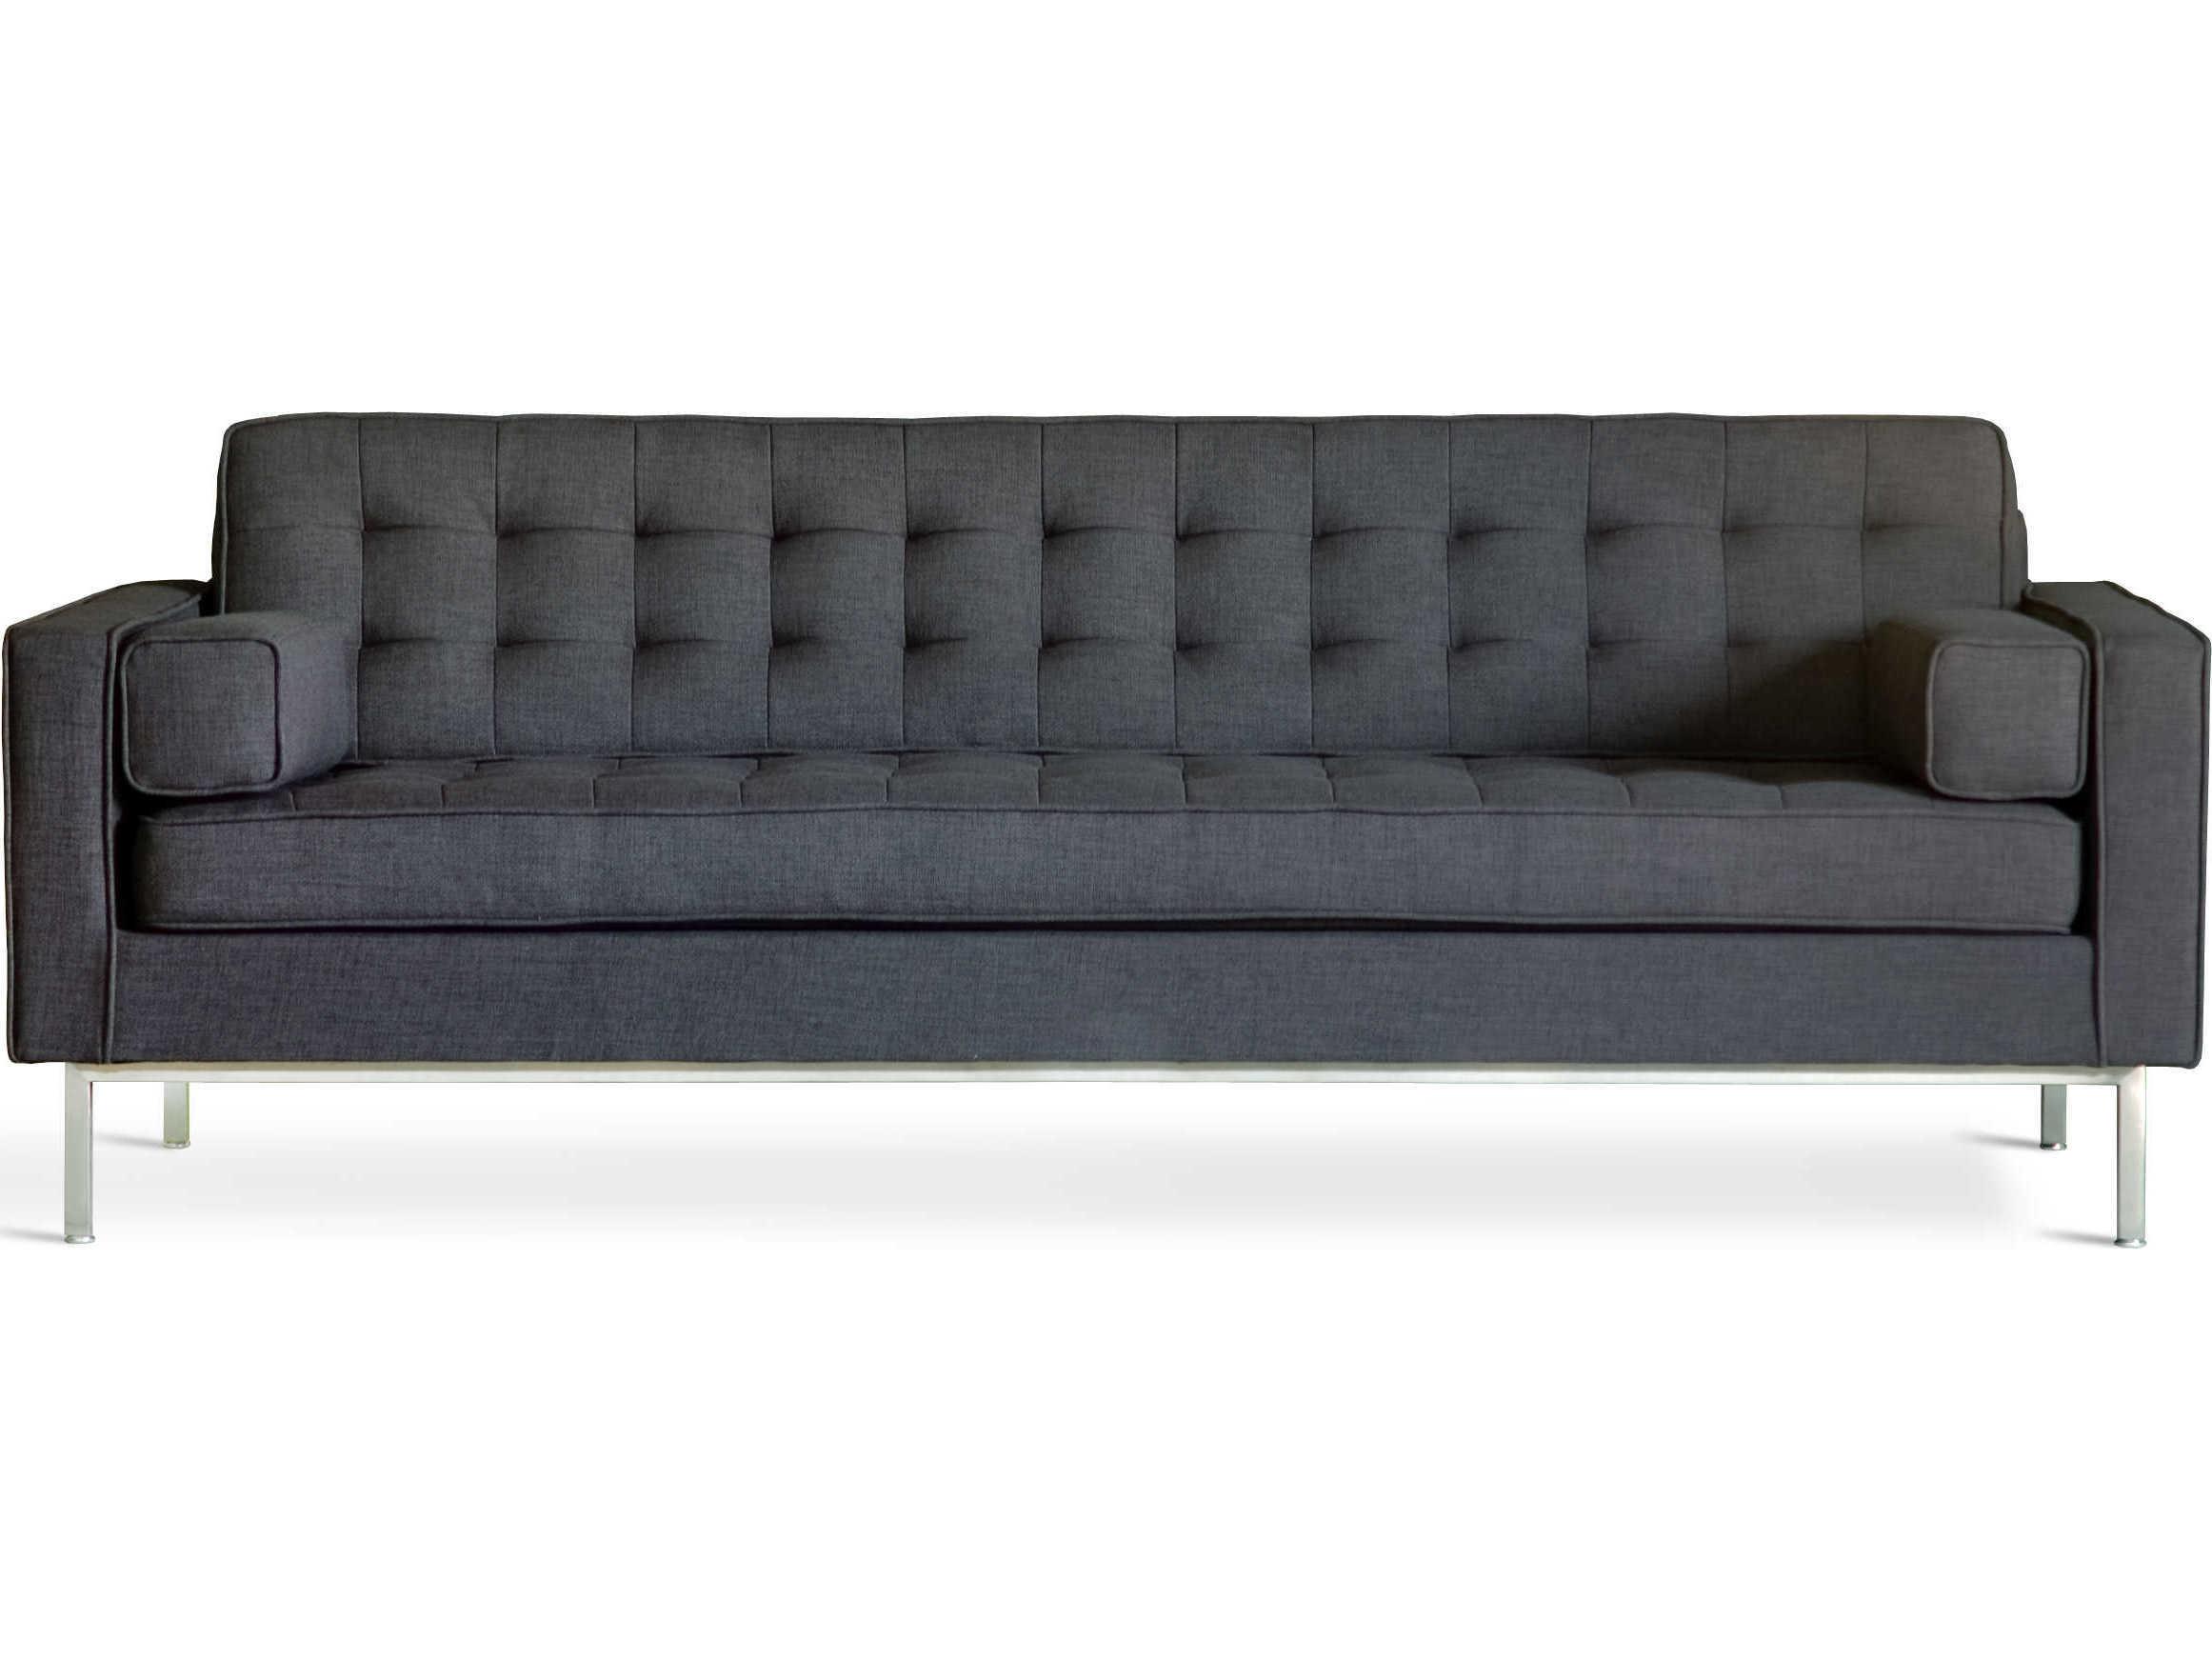 Gus* Modern Spencer Urban Tweed Ink / Stainless Steel Sofa Couch